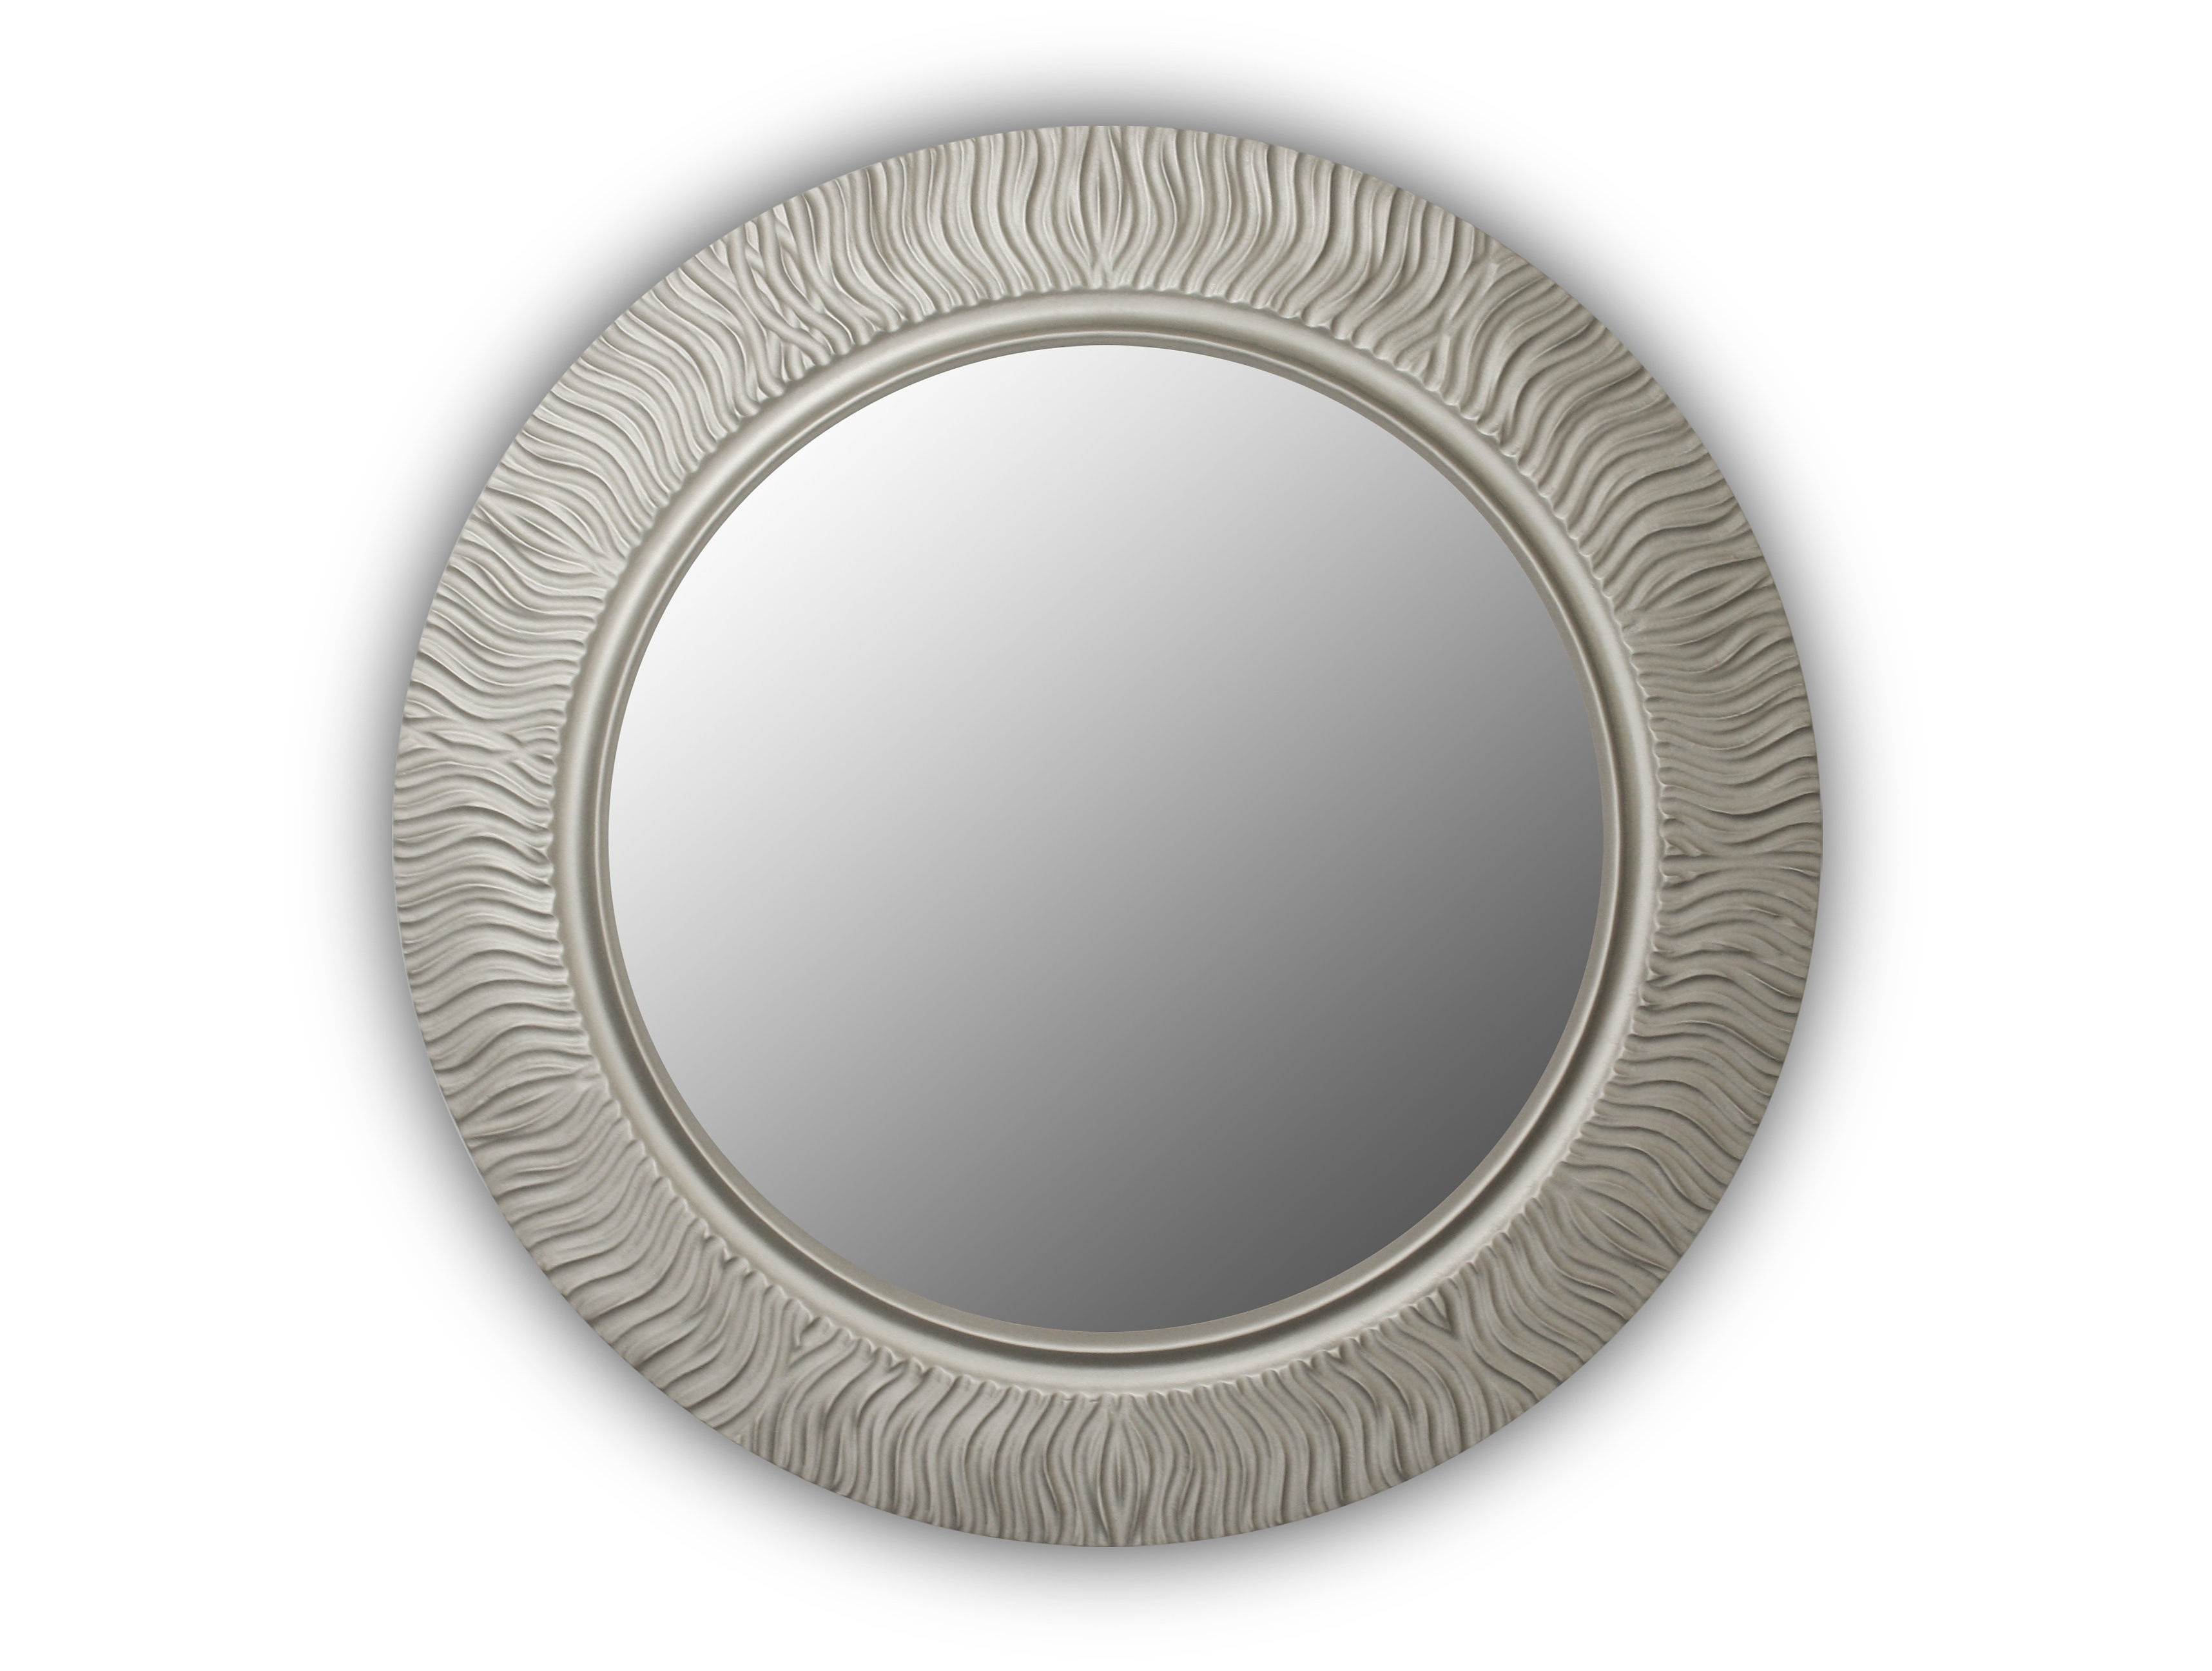 Зеркало Fashion waveНастенные зеркала<br>Патина&amp;lt;div&amp;gt;Возможен заказ изделий размерами 90 см, 75 см, 65 см&amp;lt;/div&amp;gt;<br><br>Material: Дерево<br>Height см: 3.6<br>Diameter см: 90